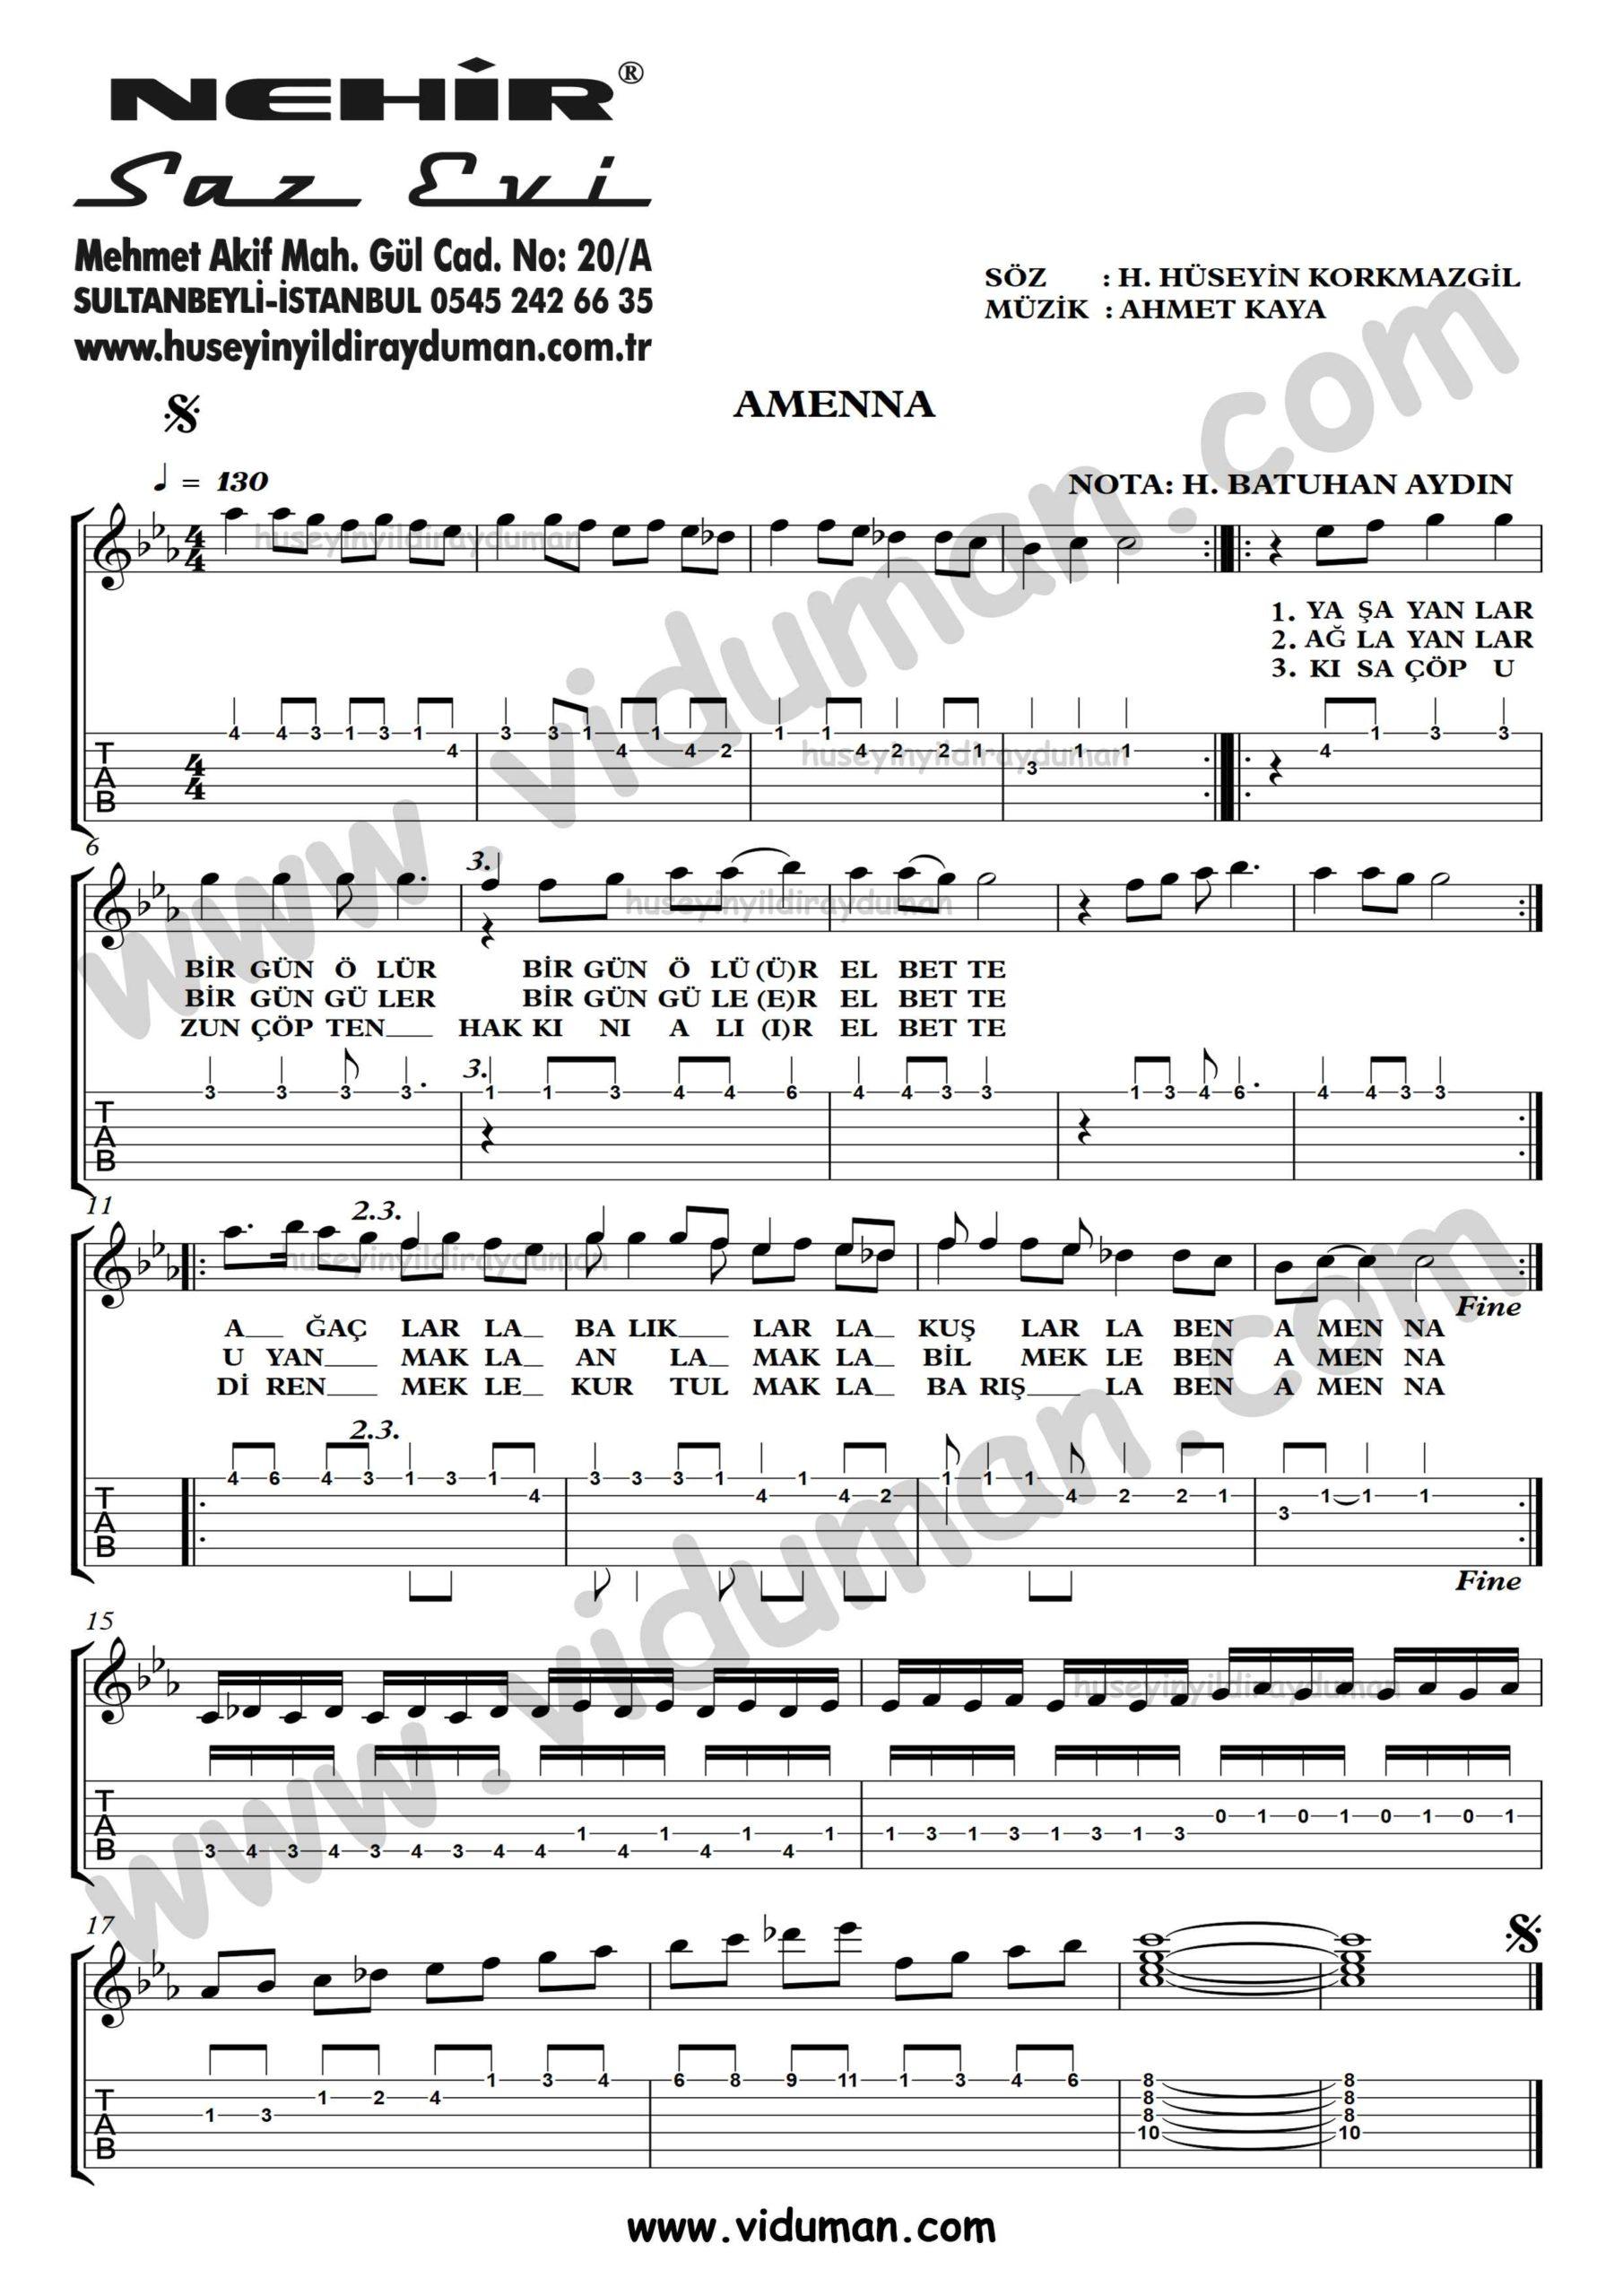 Amenna-Ahmet Kaya-Gitar Tab-Solo Notalari